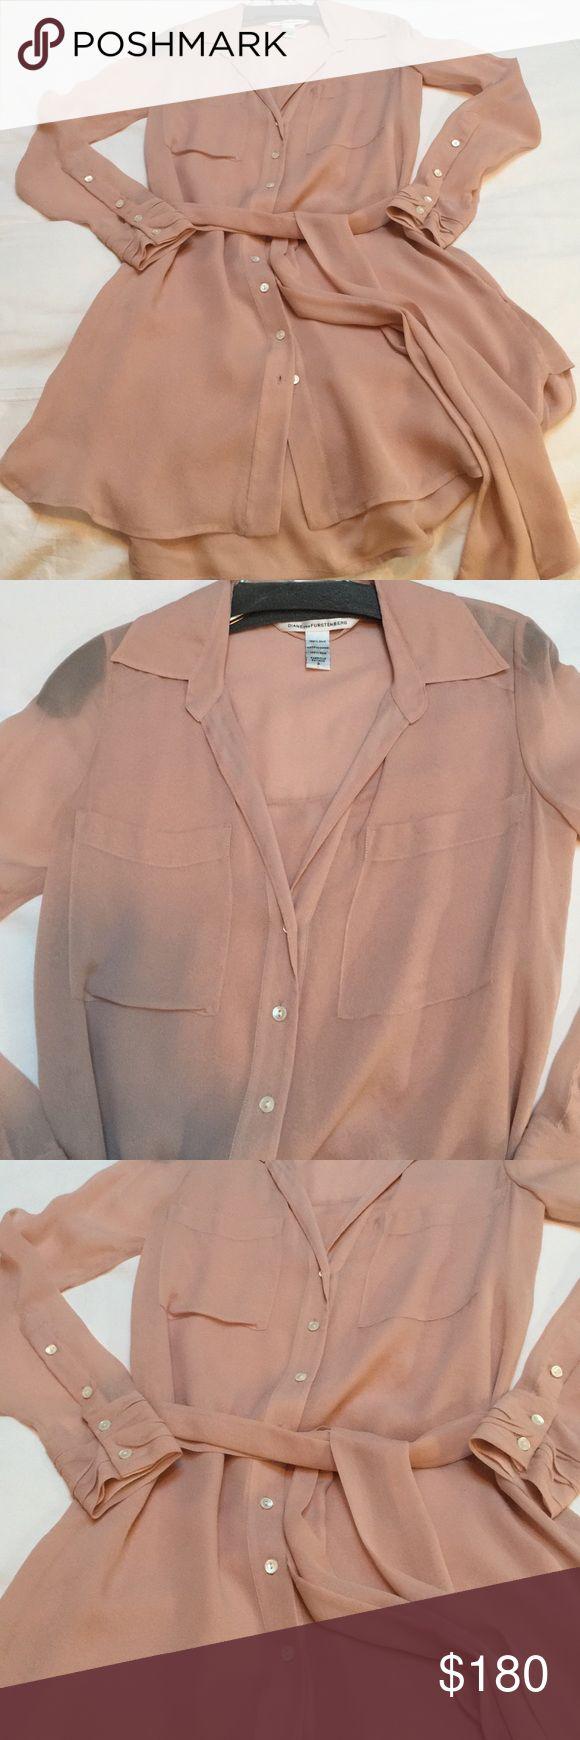 Diane von furstenberg sheer shirt dress with tie Sheer nude shirt tunic with tie Diane von Furstenberg Dresses Mini